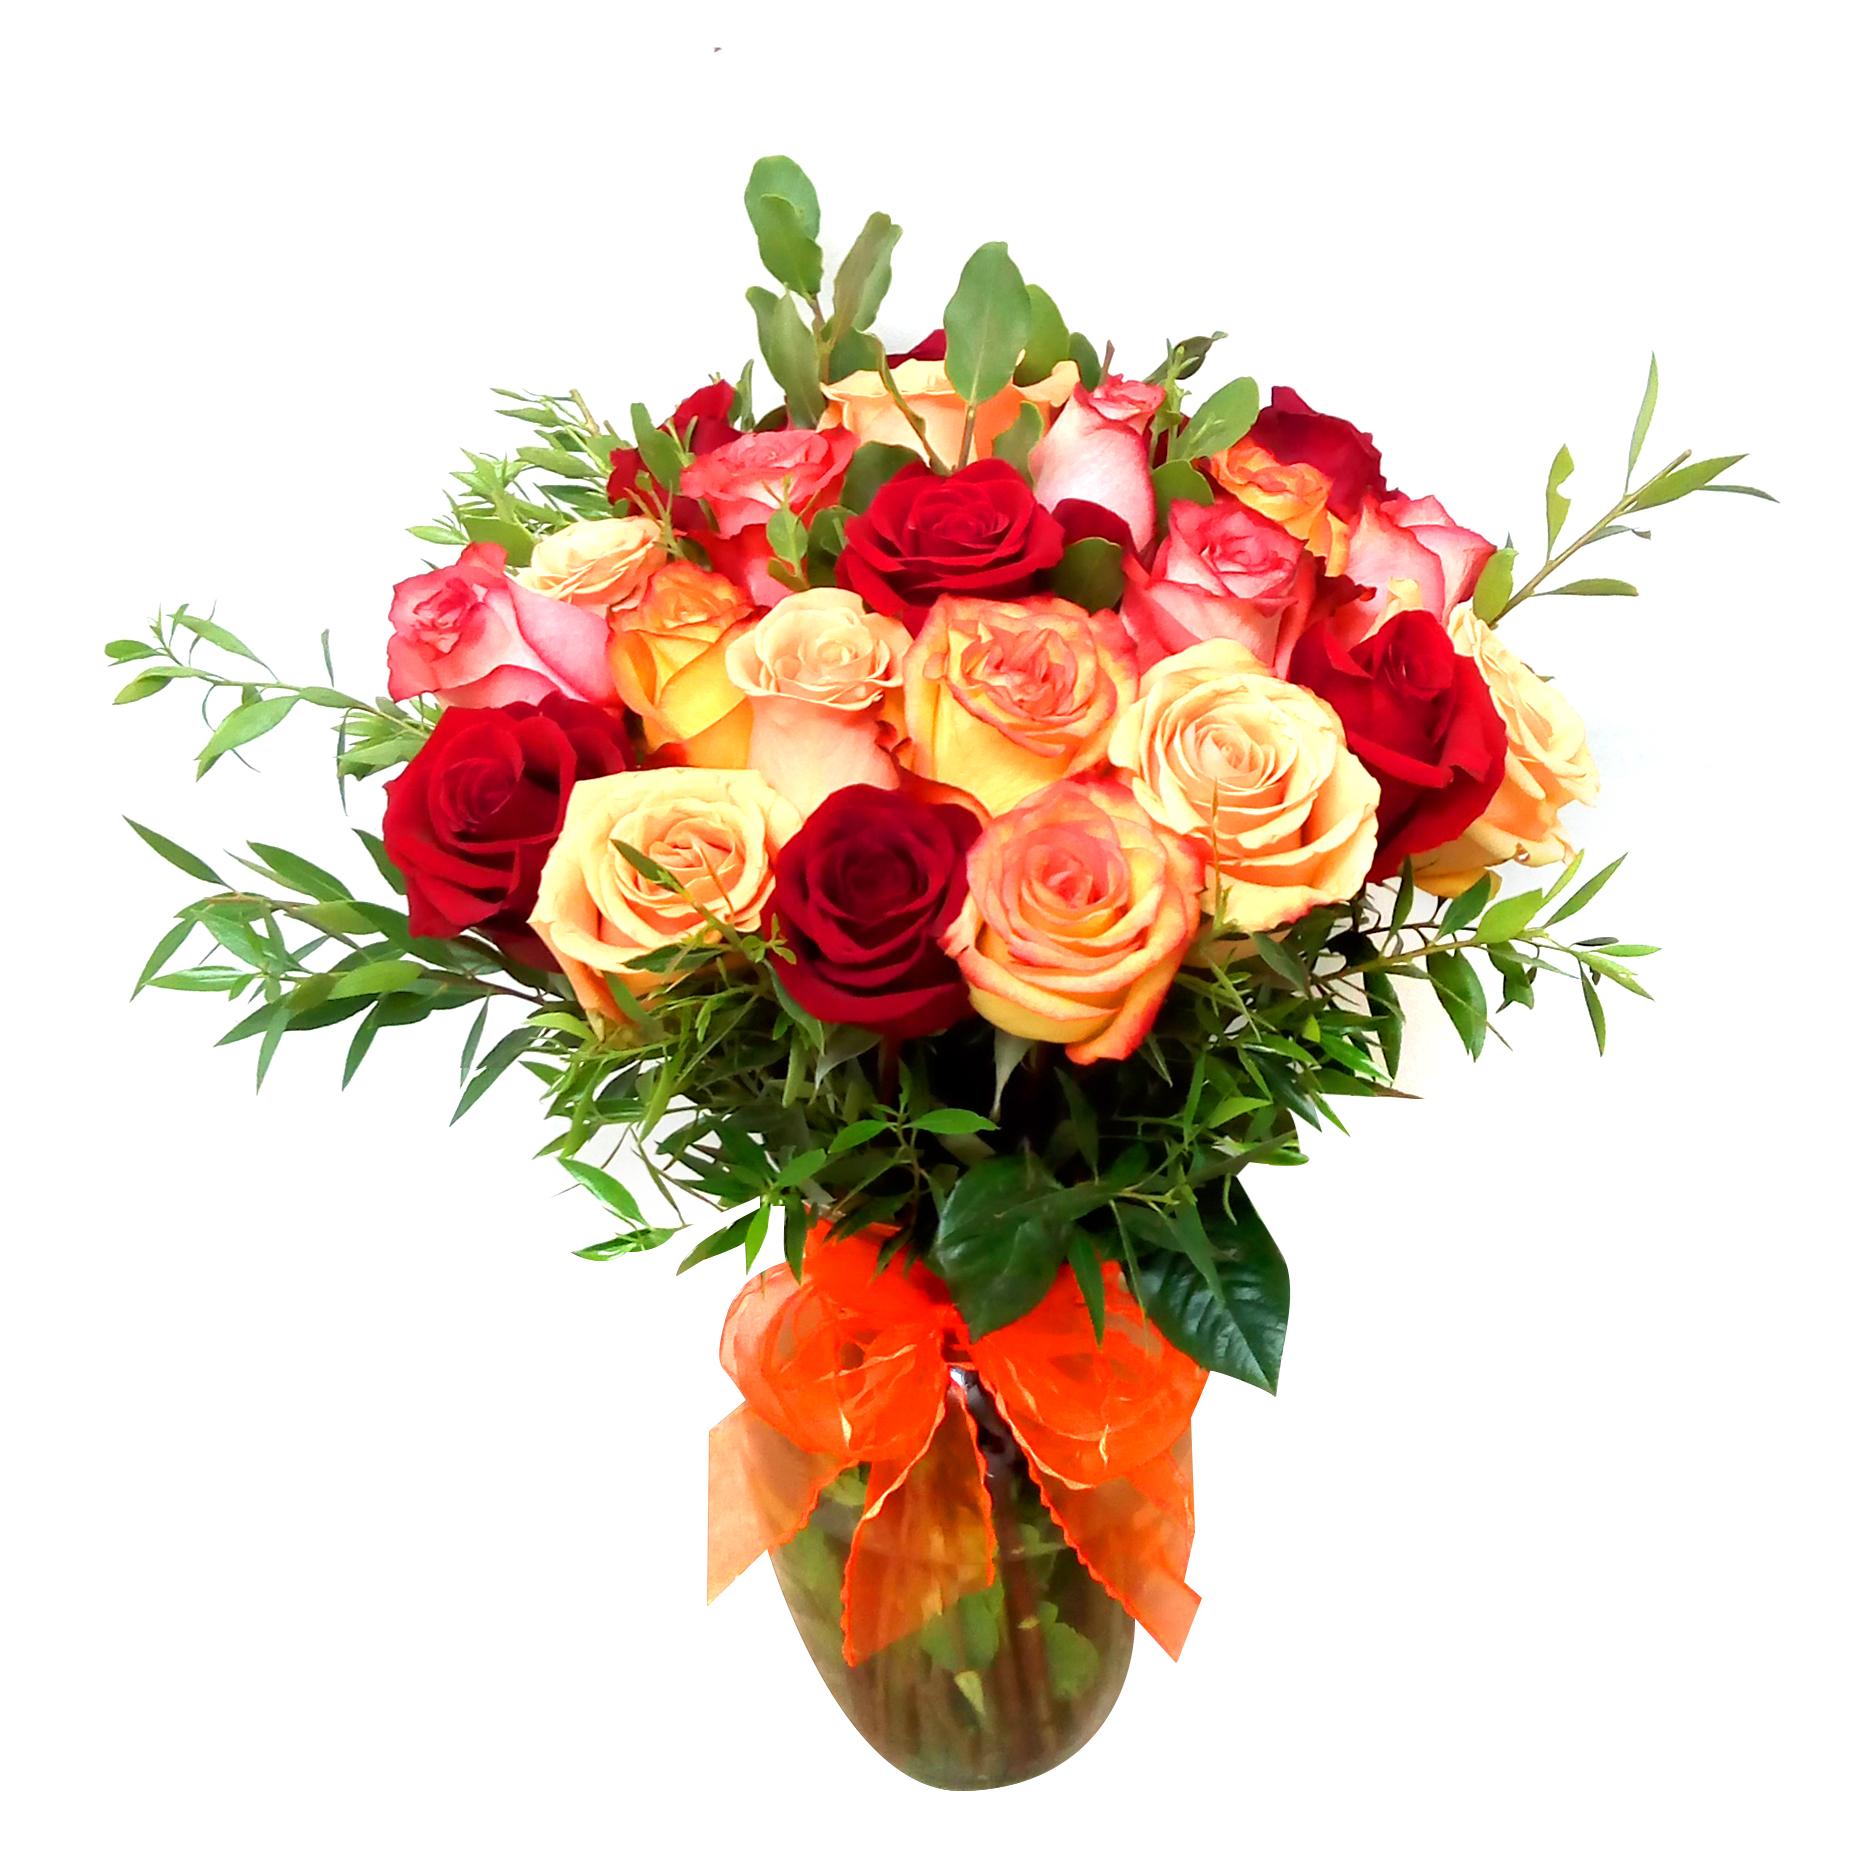 Floreros de Rosas Rosadas y Damasco